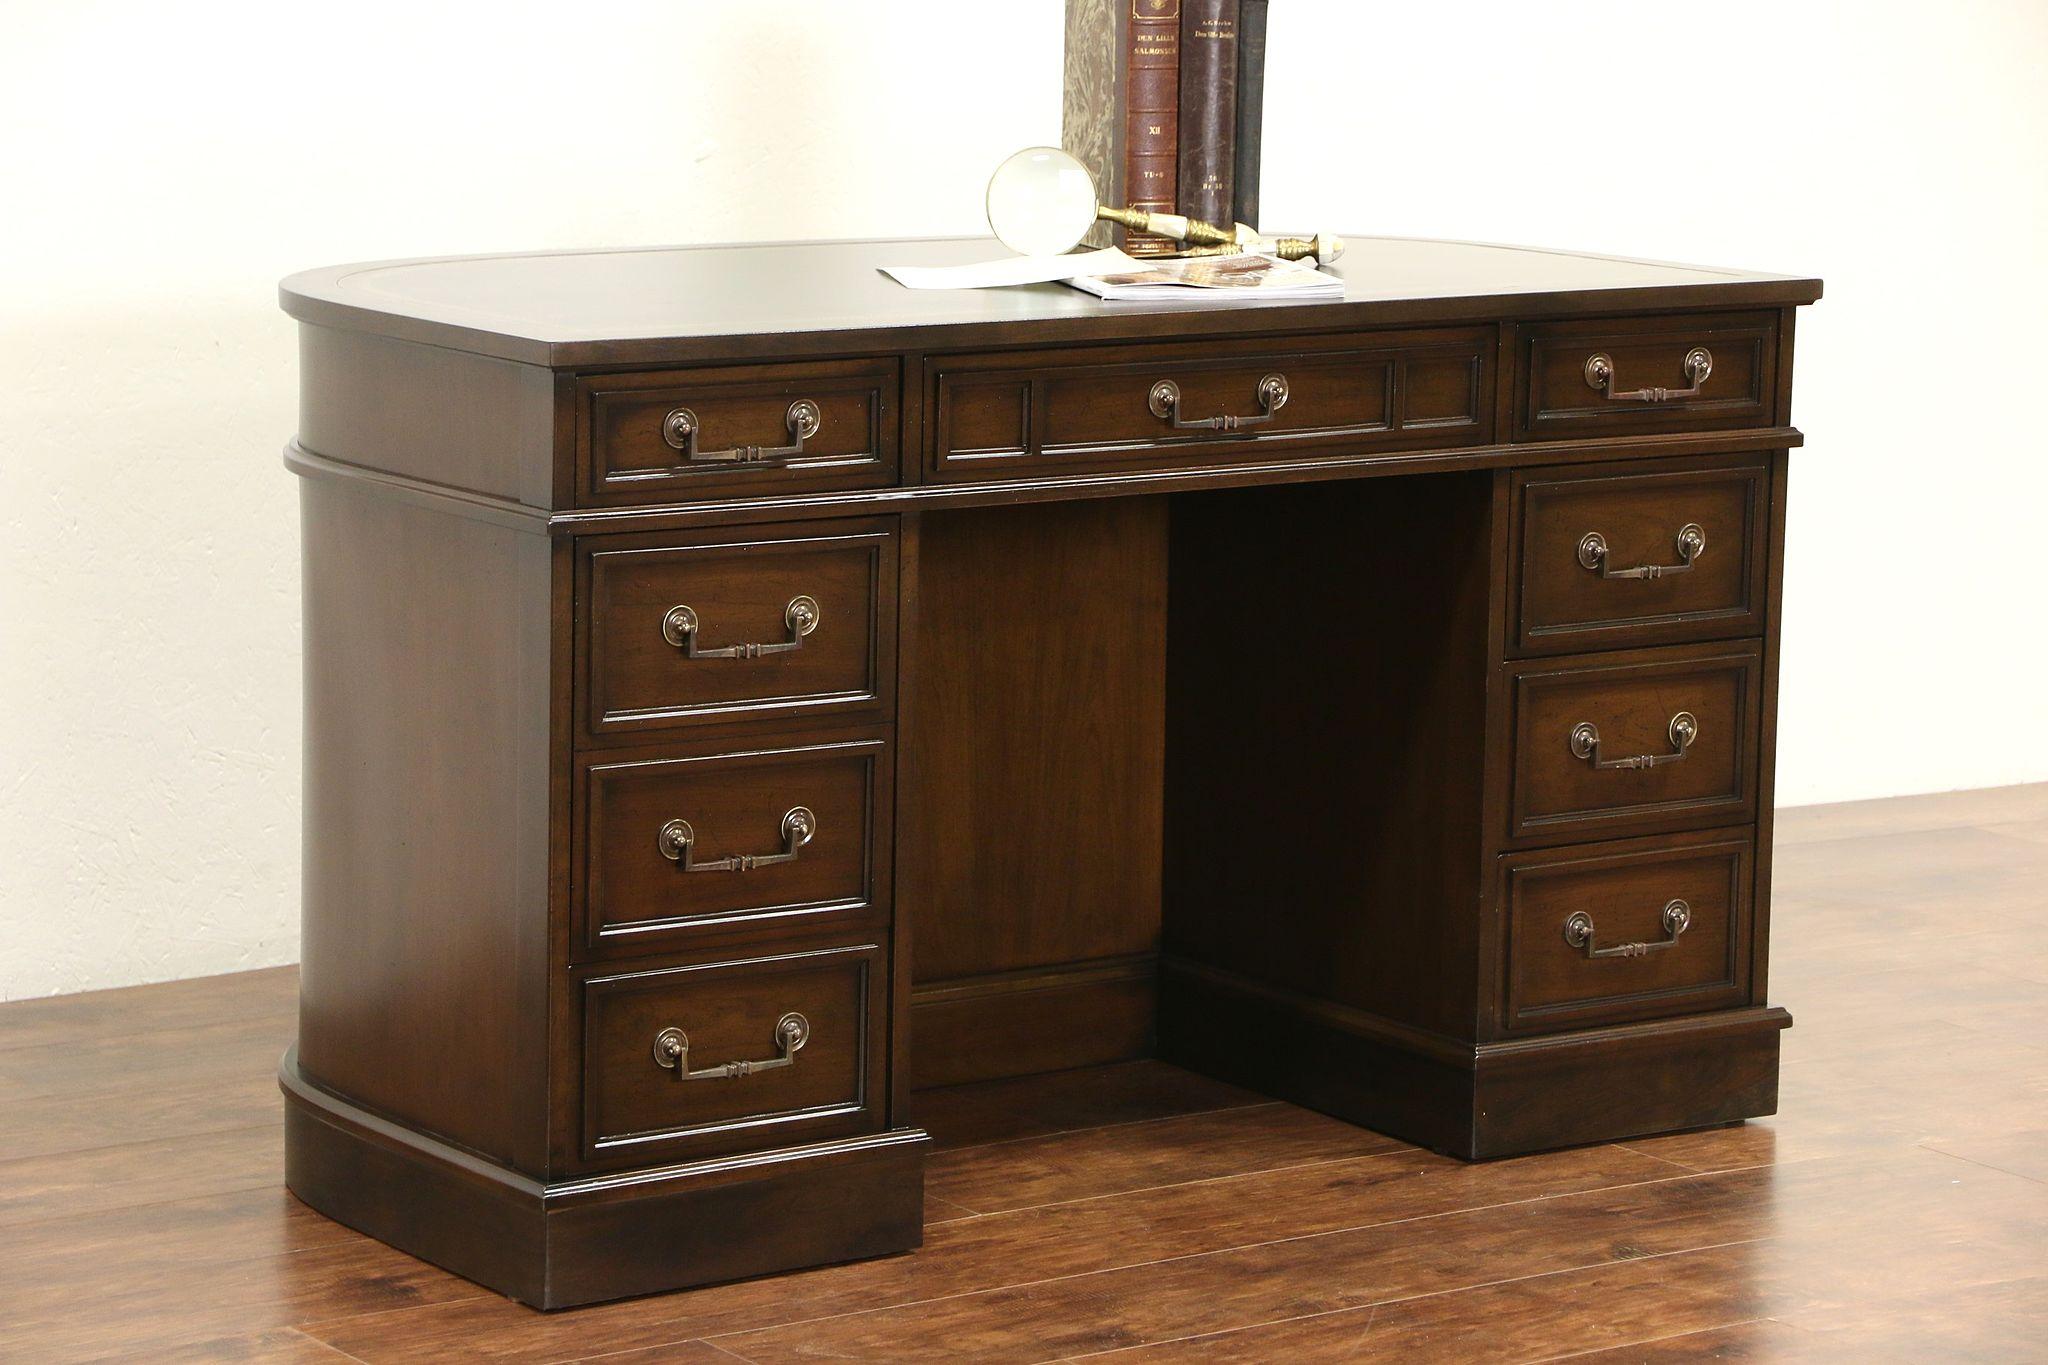 sligh furniture office room. Cherry 1970 Vintage Leather Top Desk, Signed Sligh Furniture Office Room